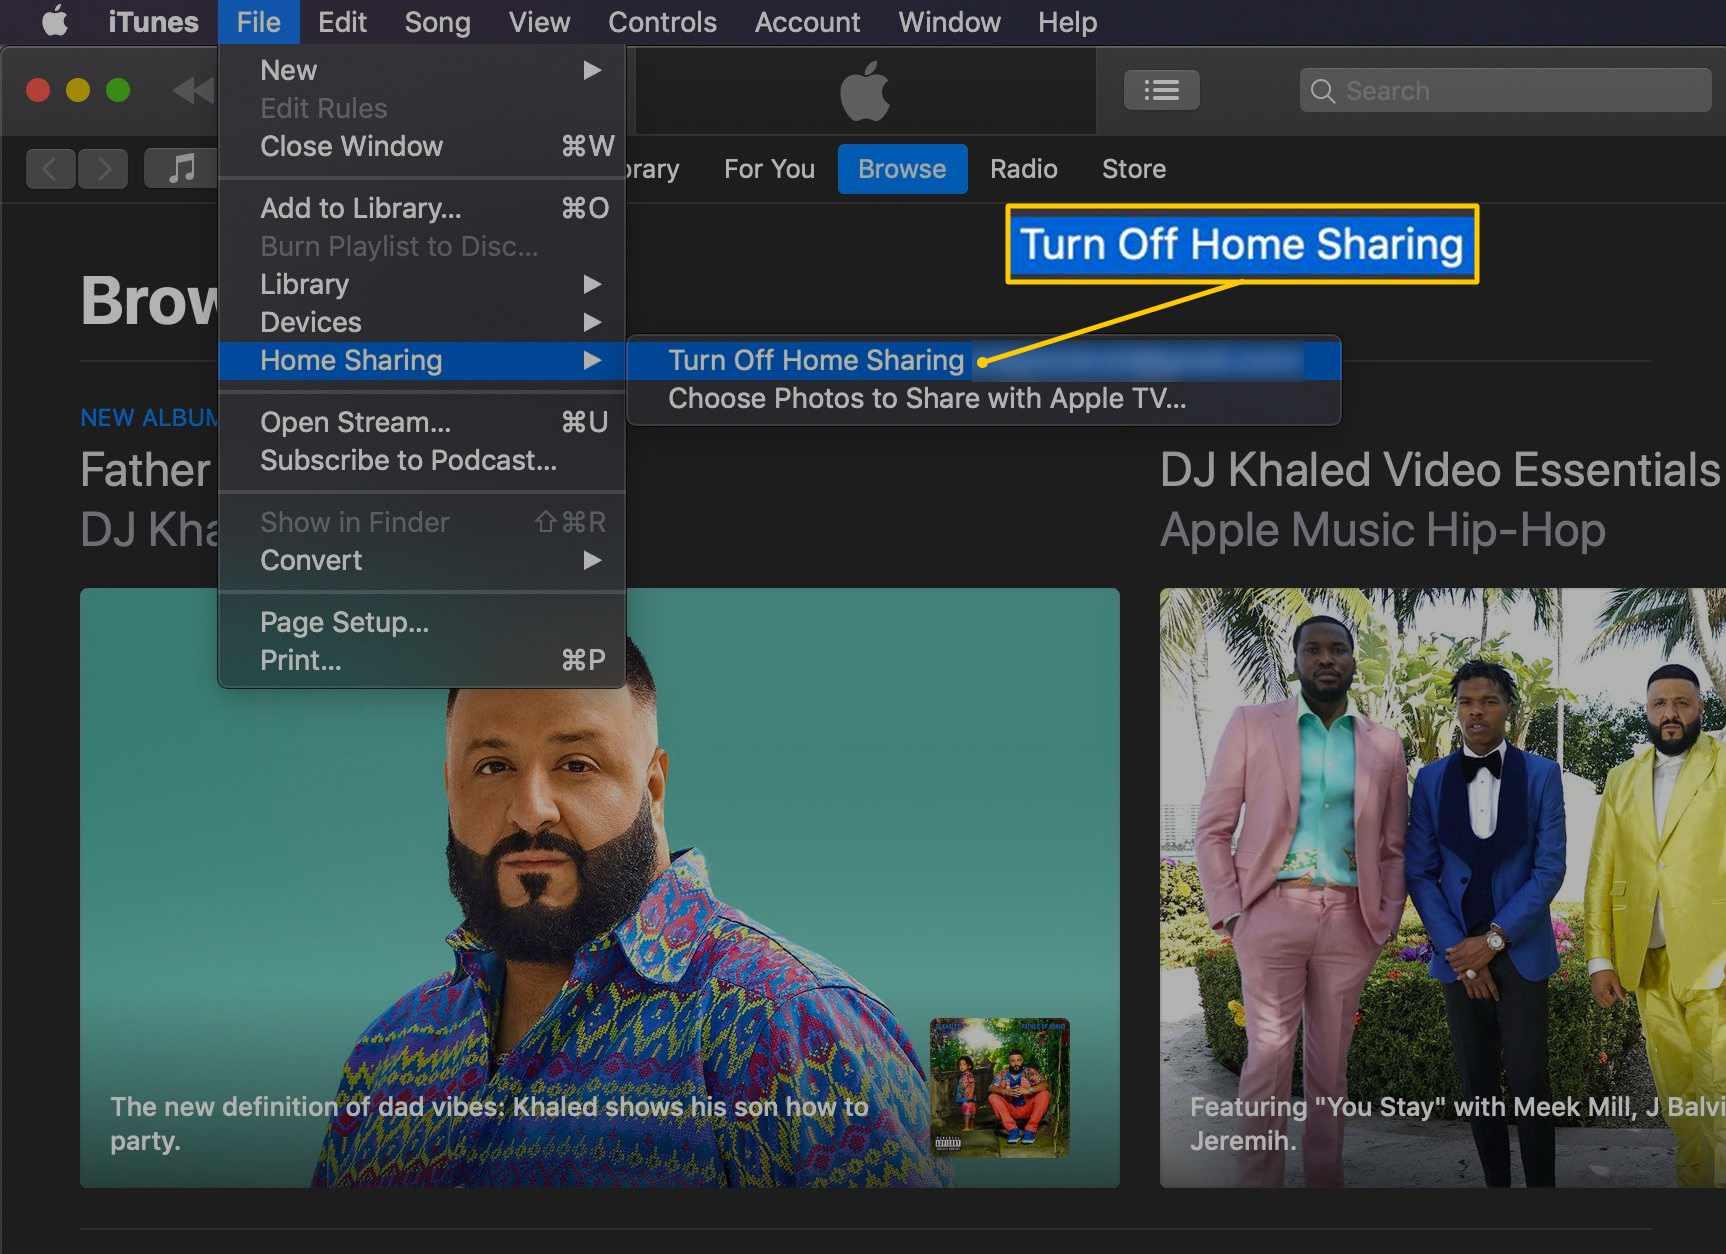 Turn Off Home Sharing menu item in iTunes